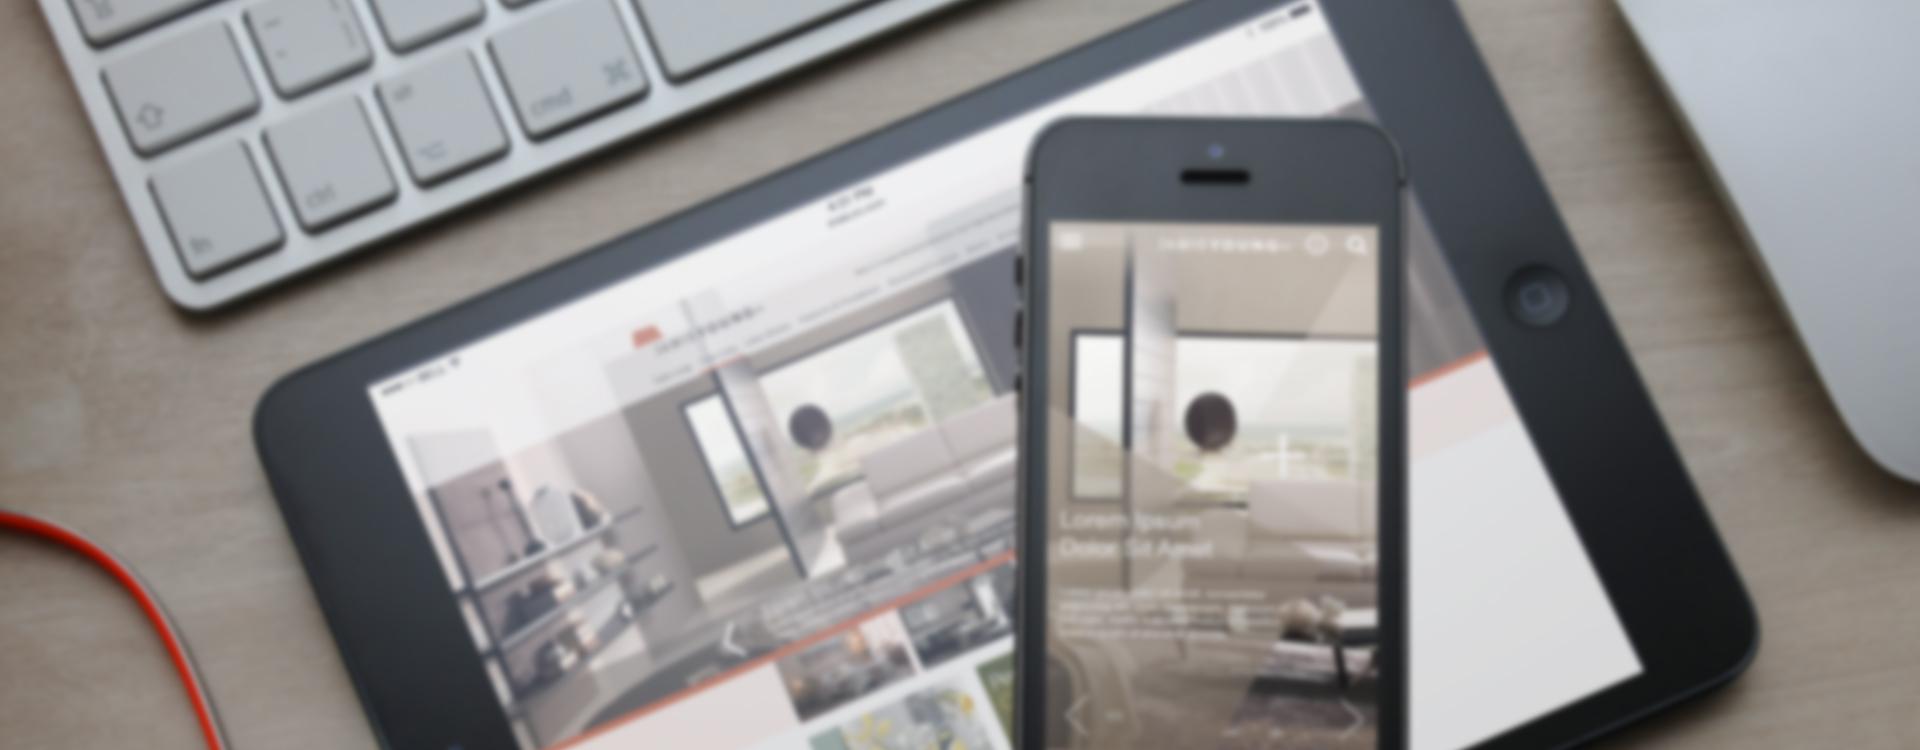 Web Future Solutions - Website Design Agency New York - Web